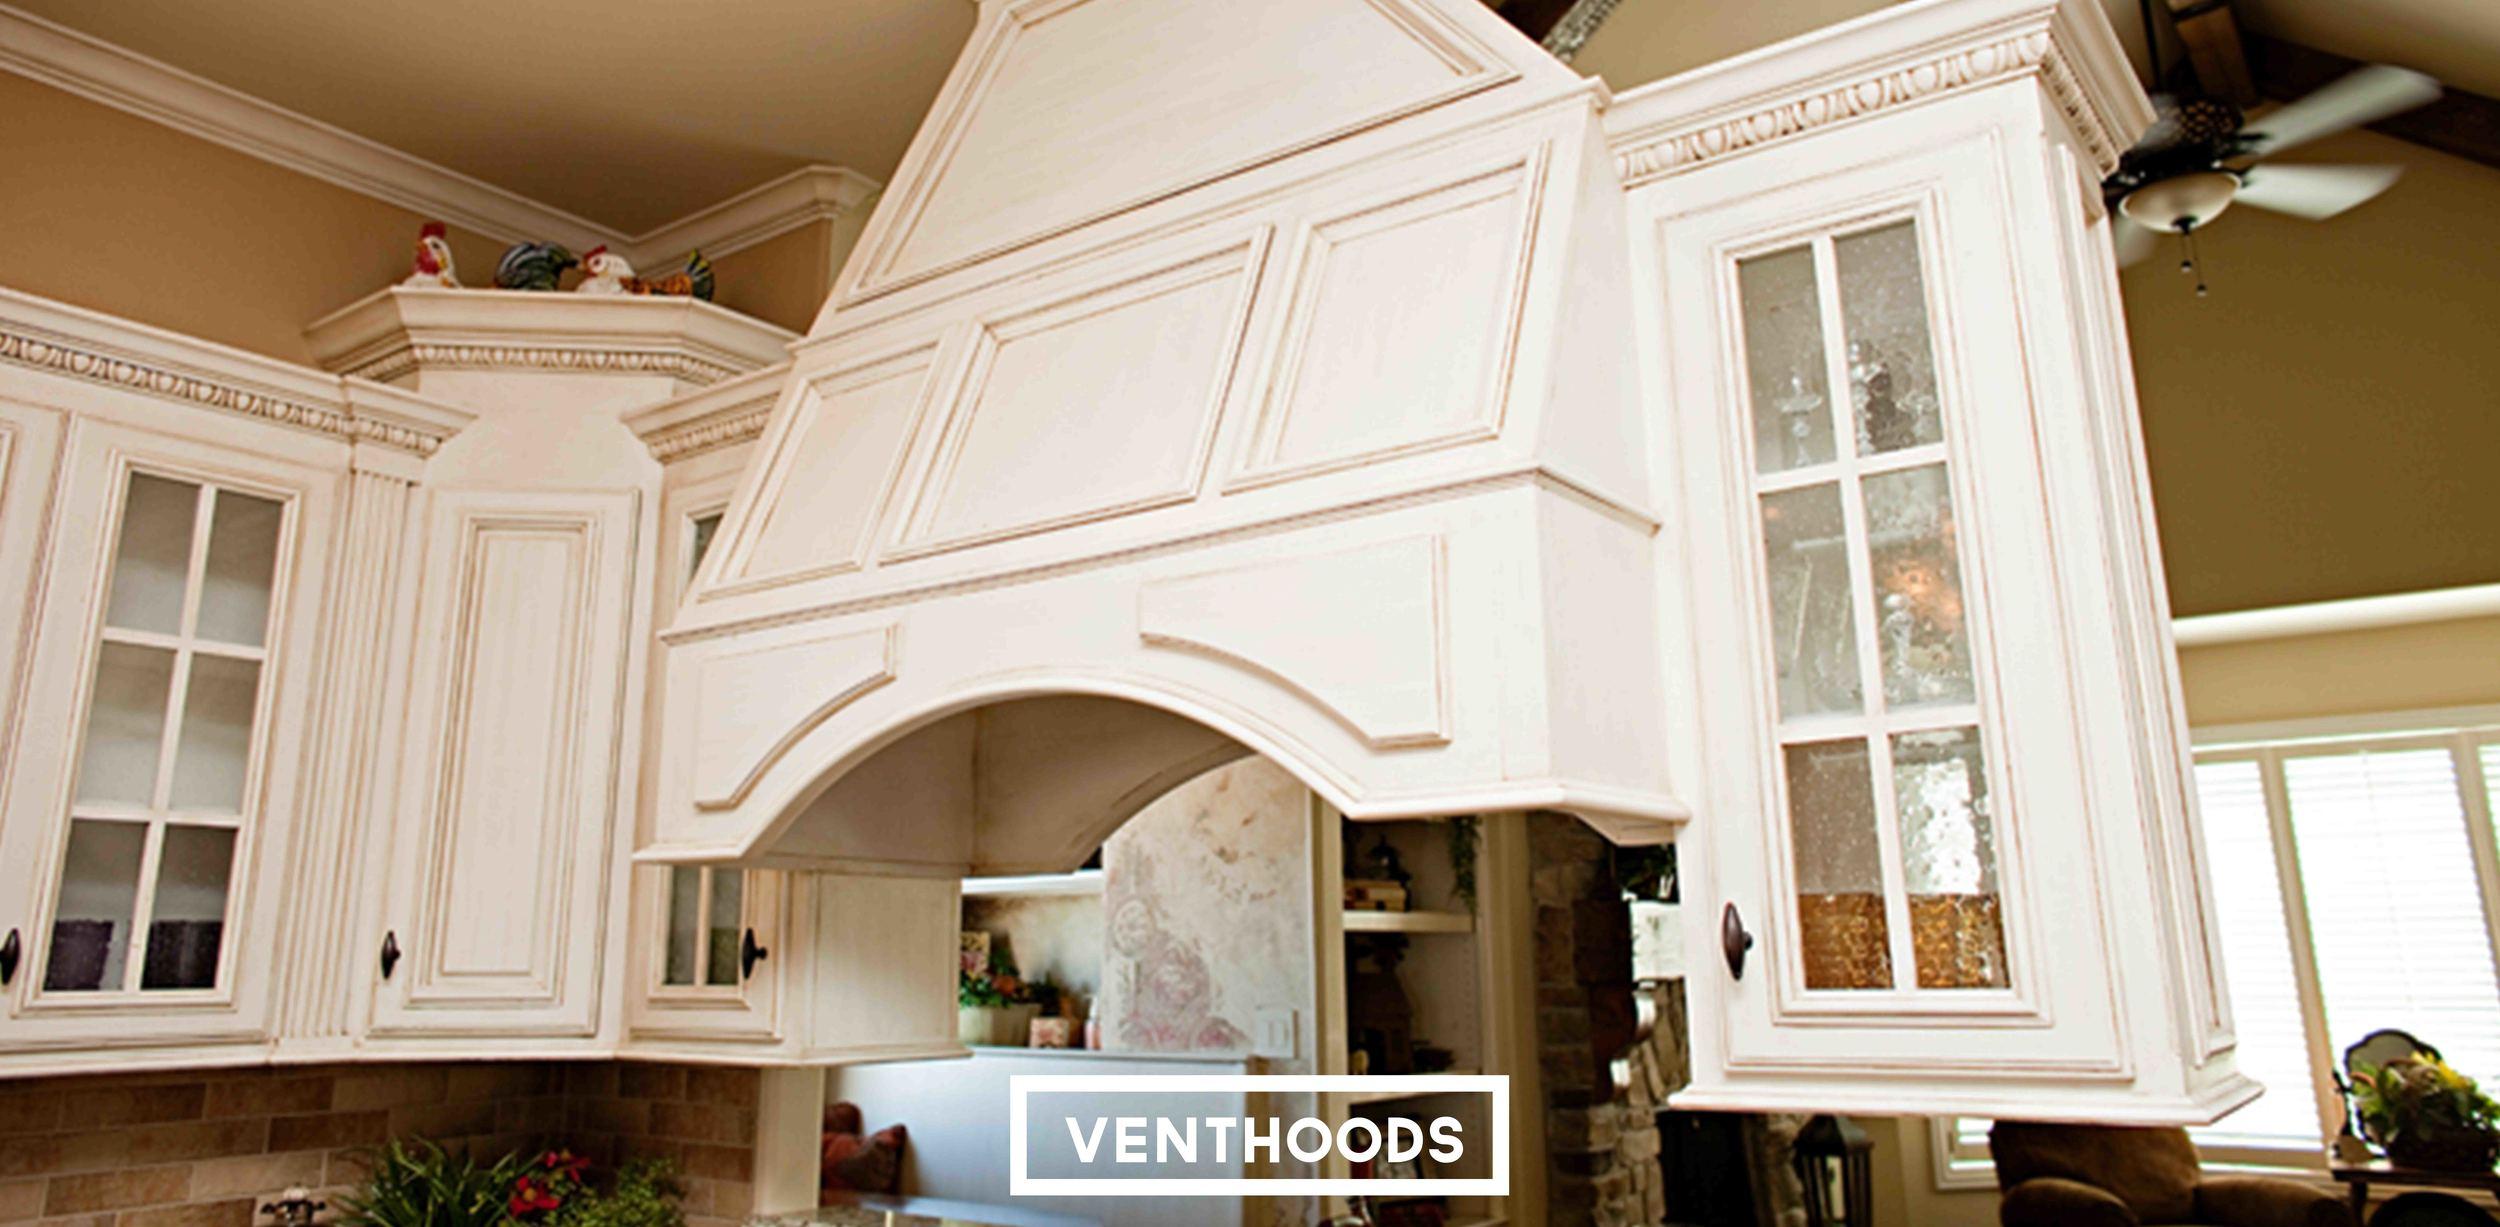 Venthood2.jpg